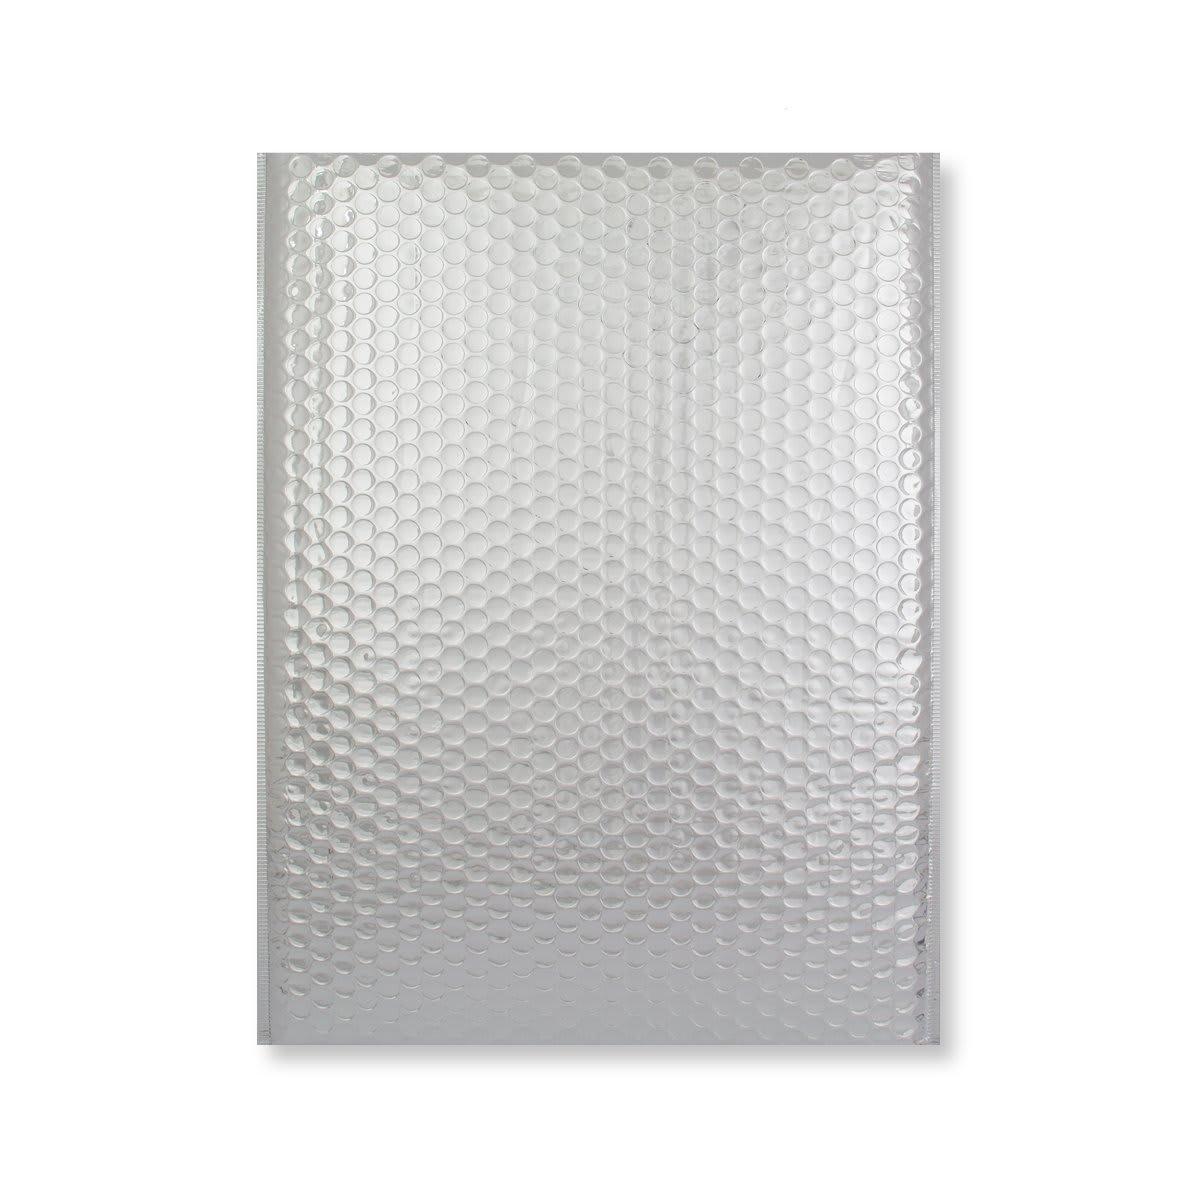 C3 GLOSS METALLIC SILVER PADDED ENVELOPES (450 x 320MM)